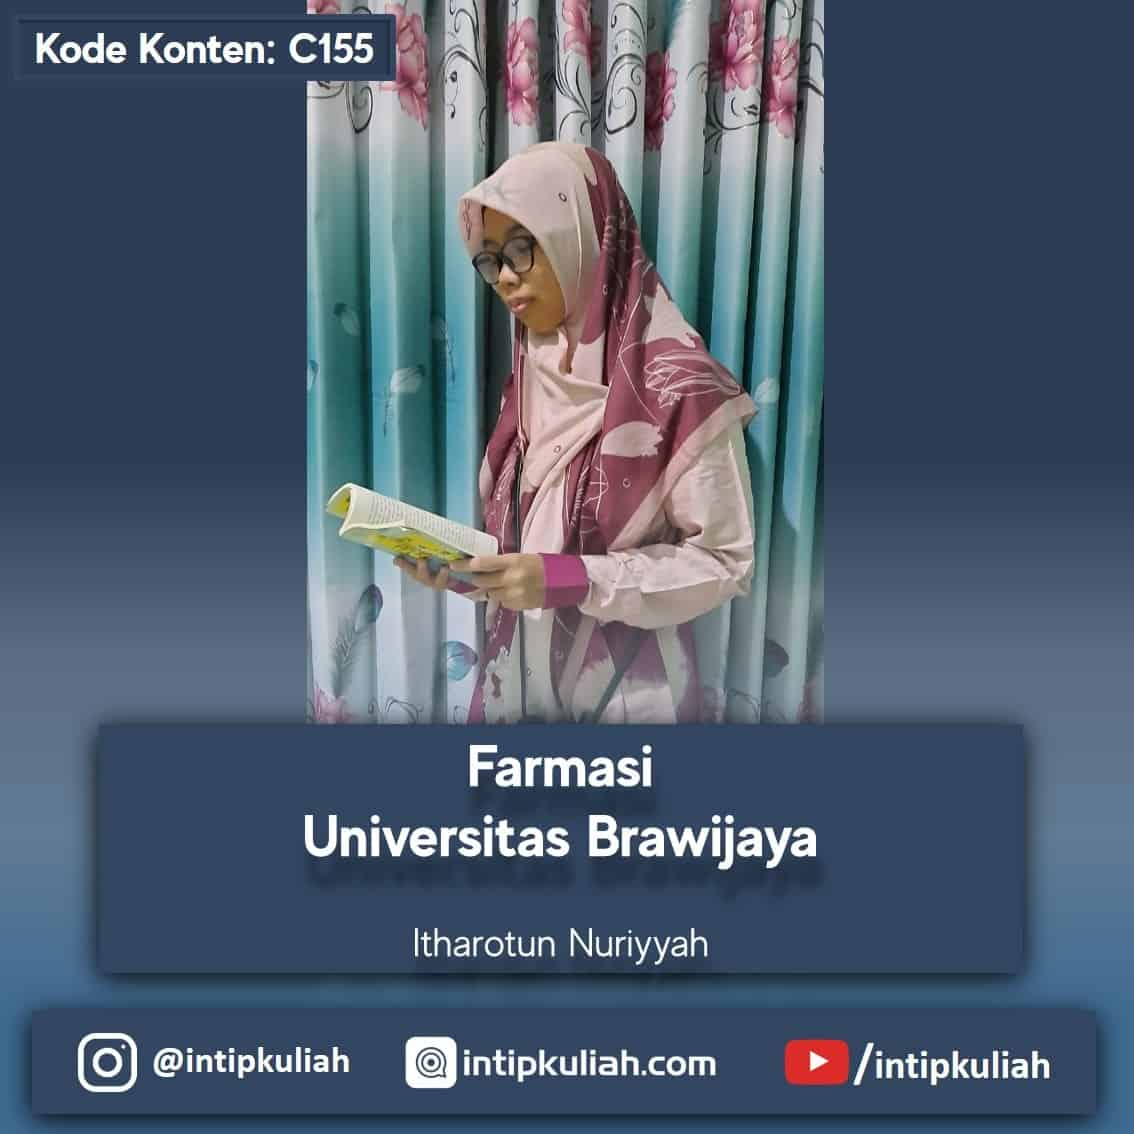 Farmasi Universitas Brawijaya (Itharotun)